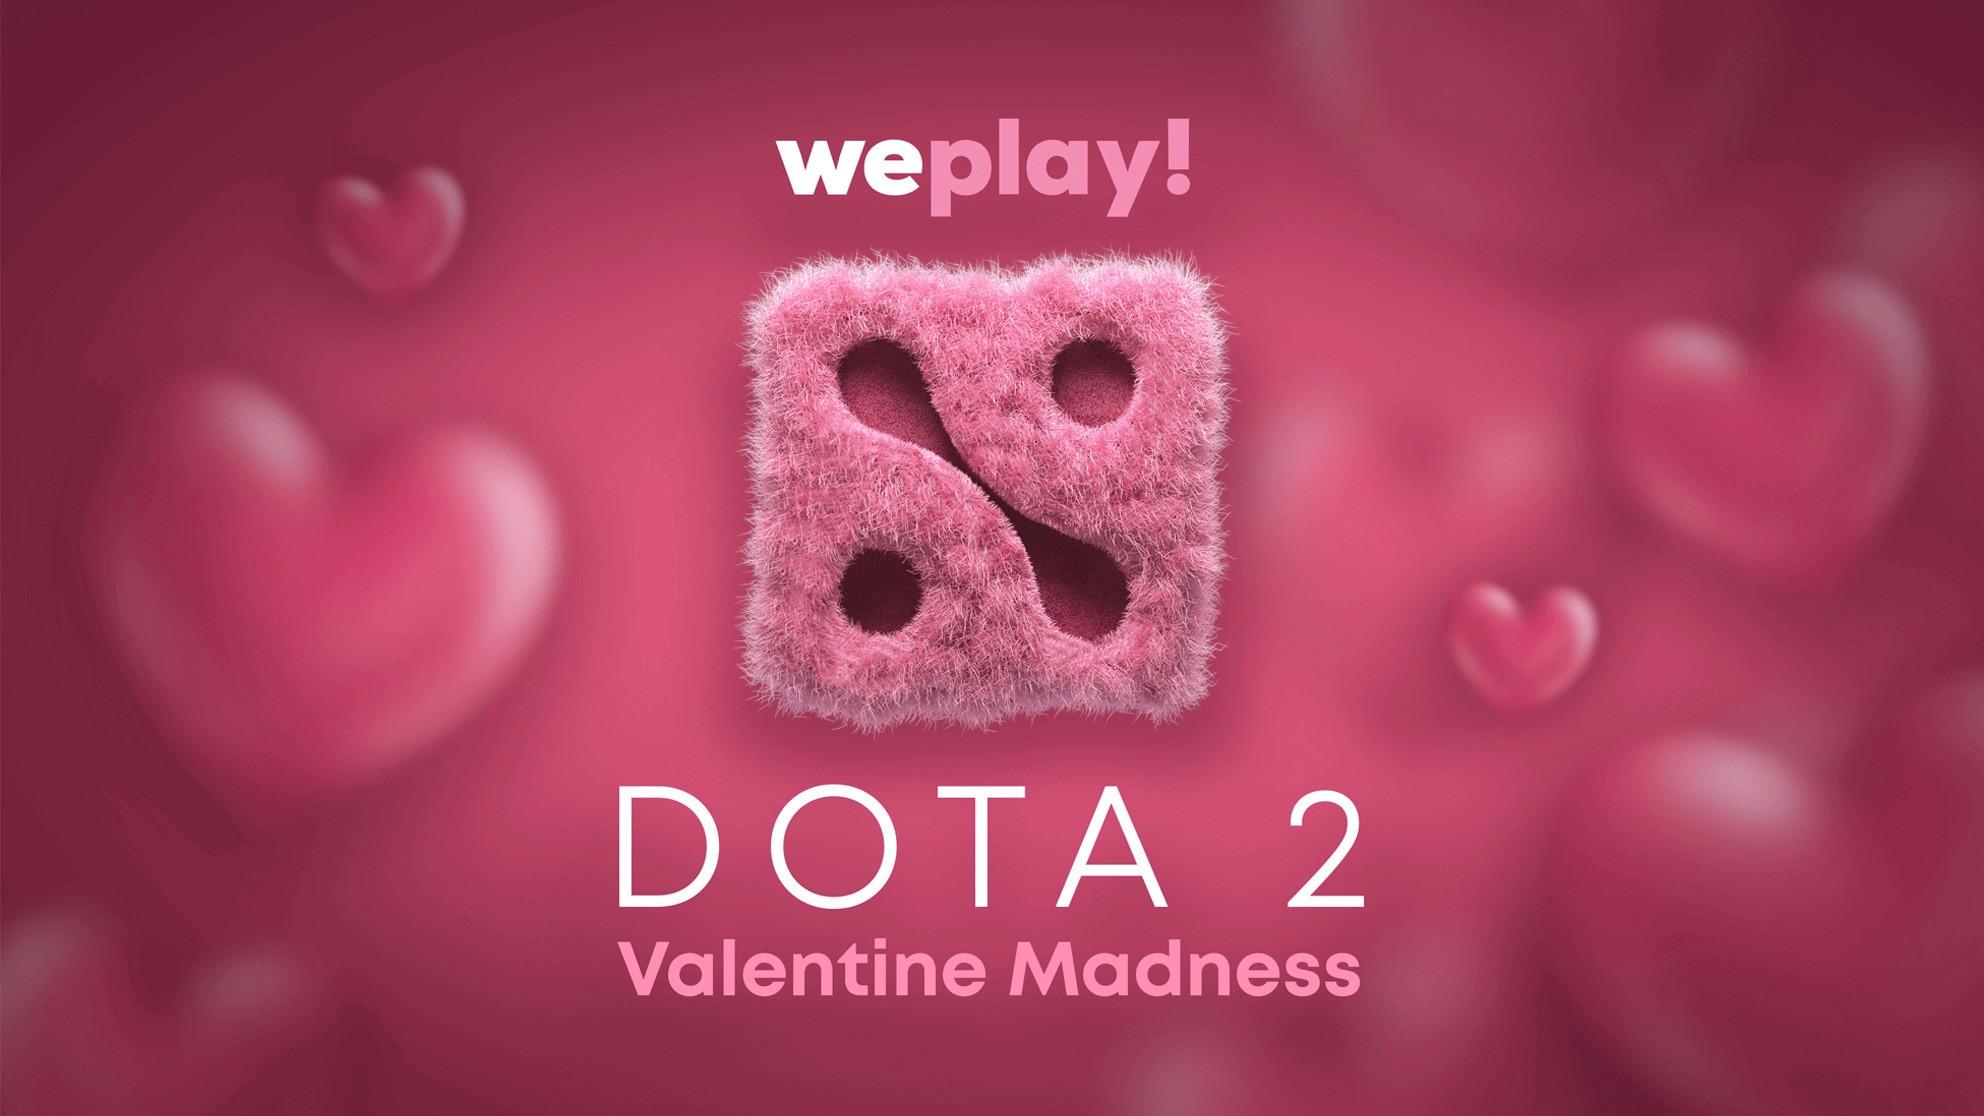 Анонс участников Valentine Madness